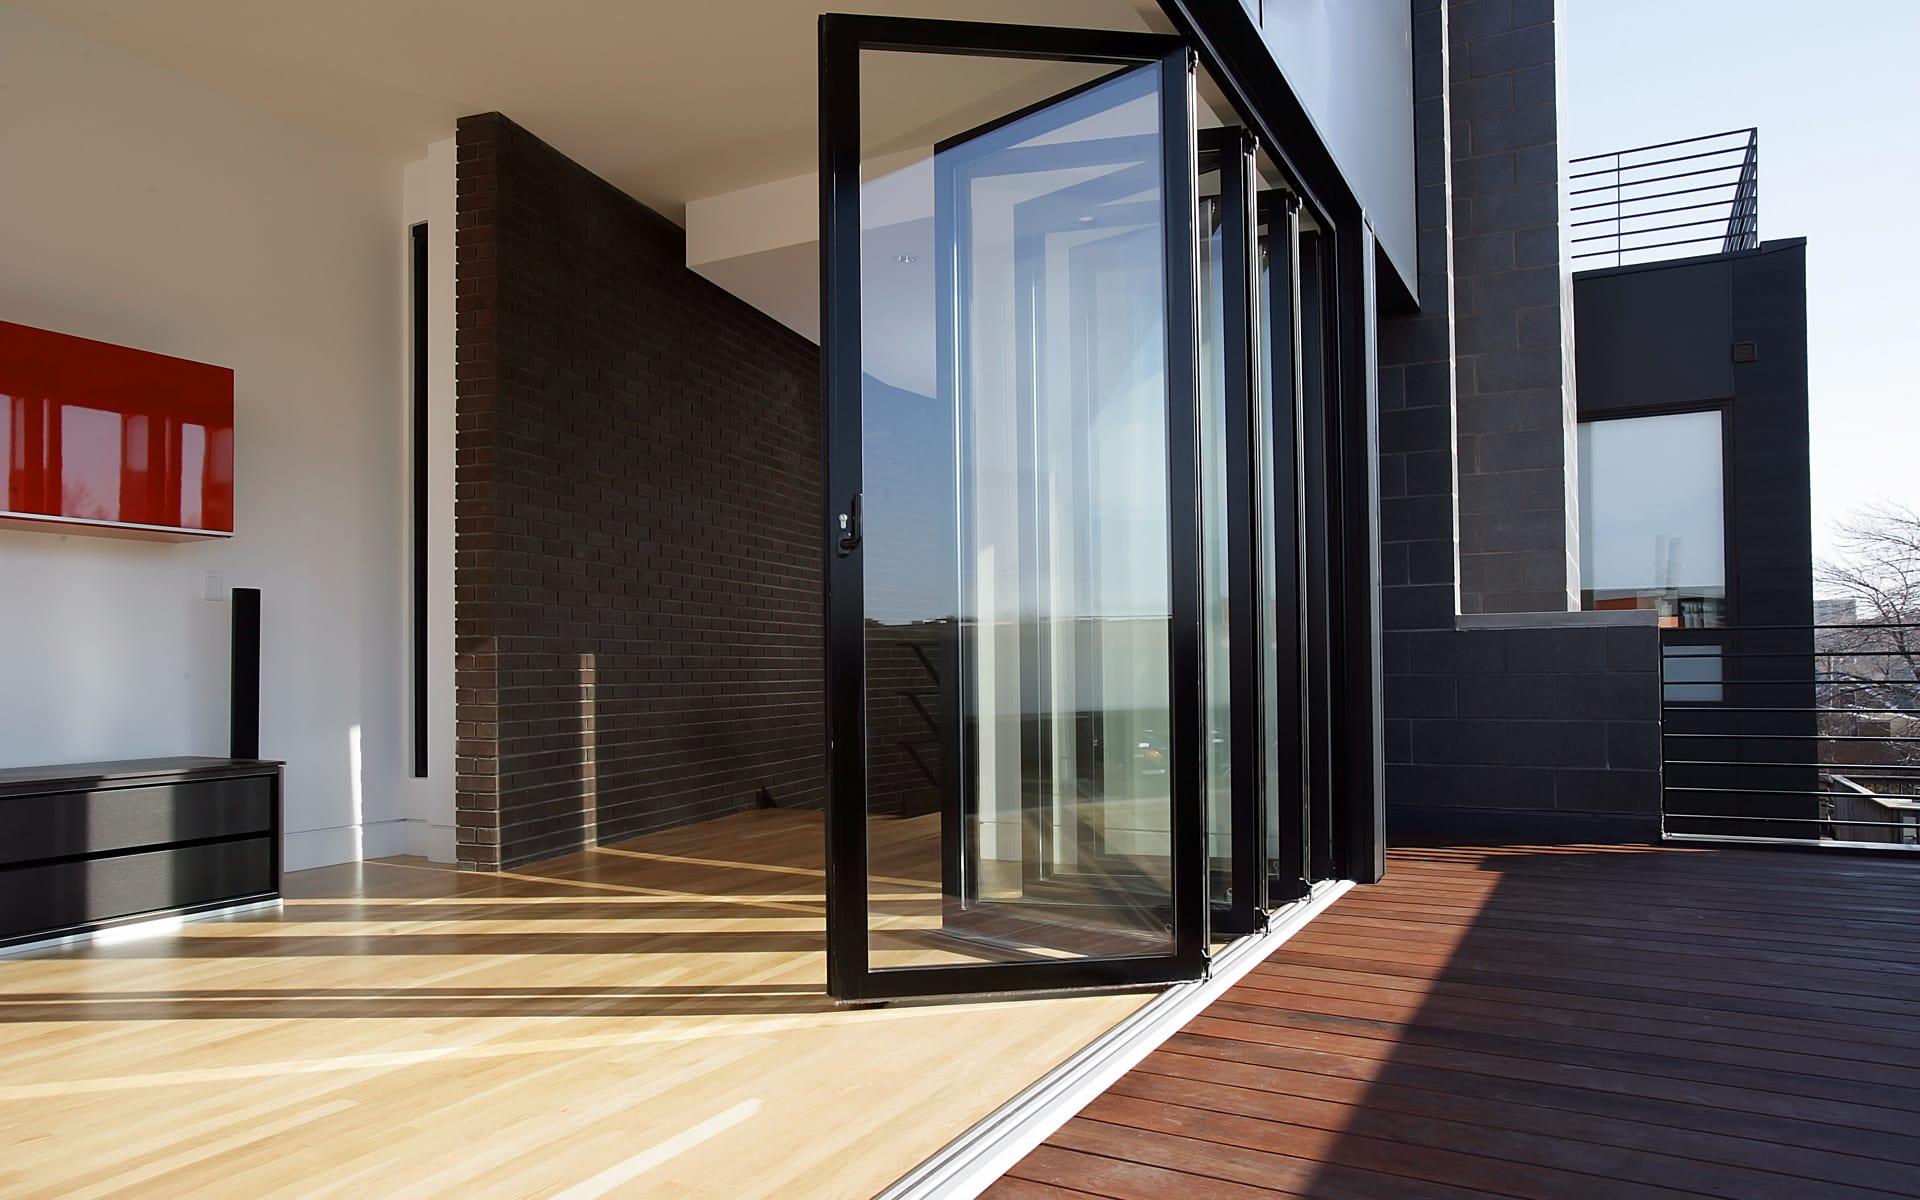 Falttüren eröffnen neuen Raum ins Freie